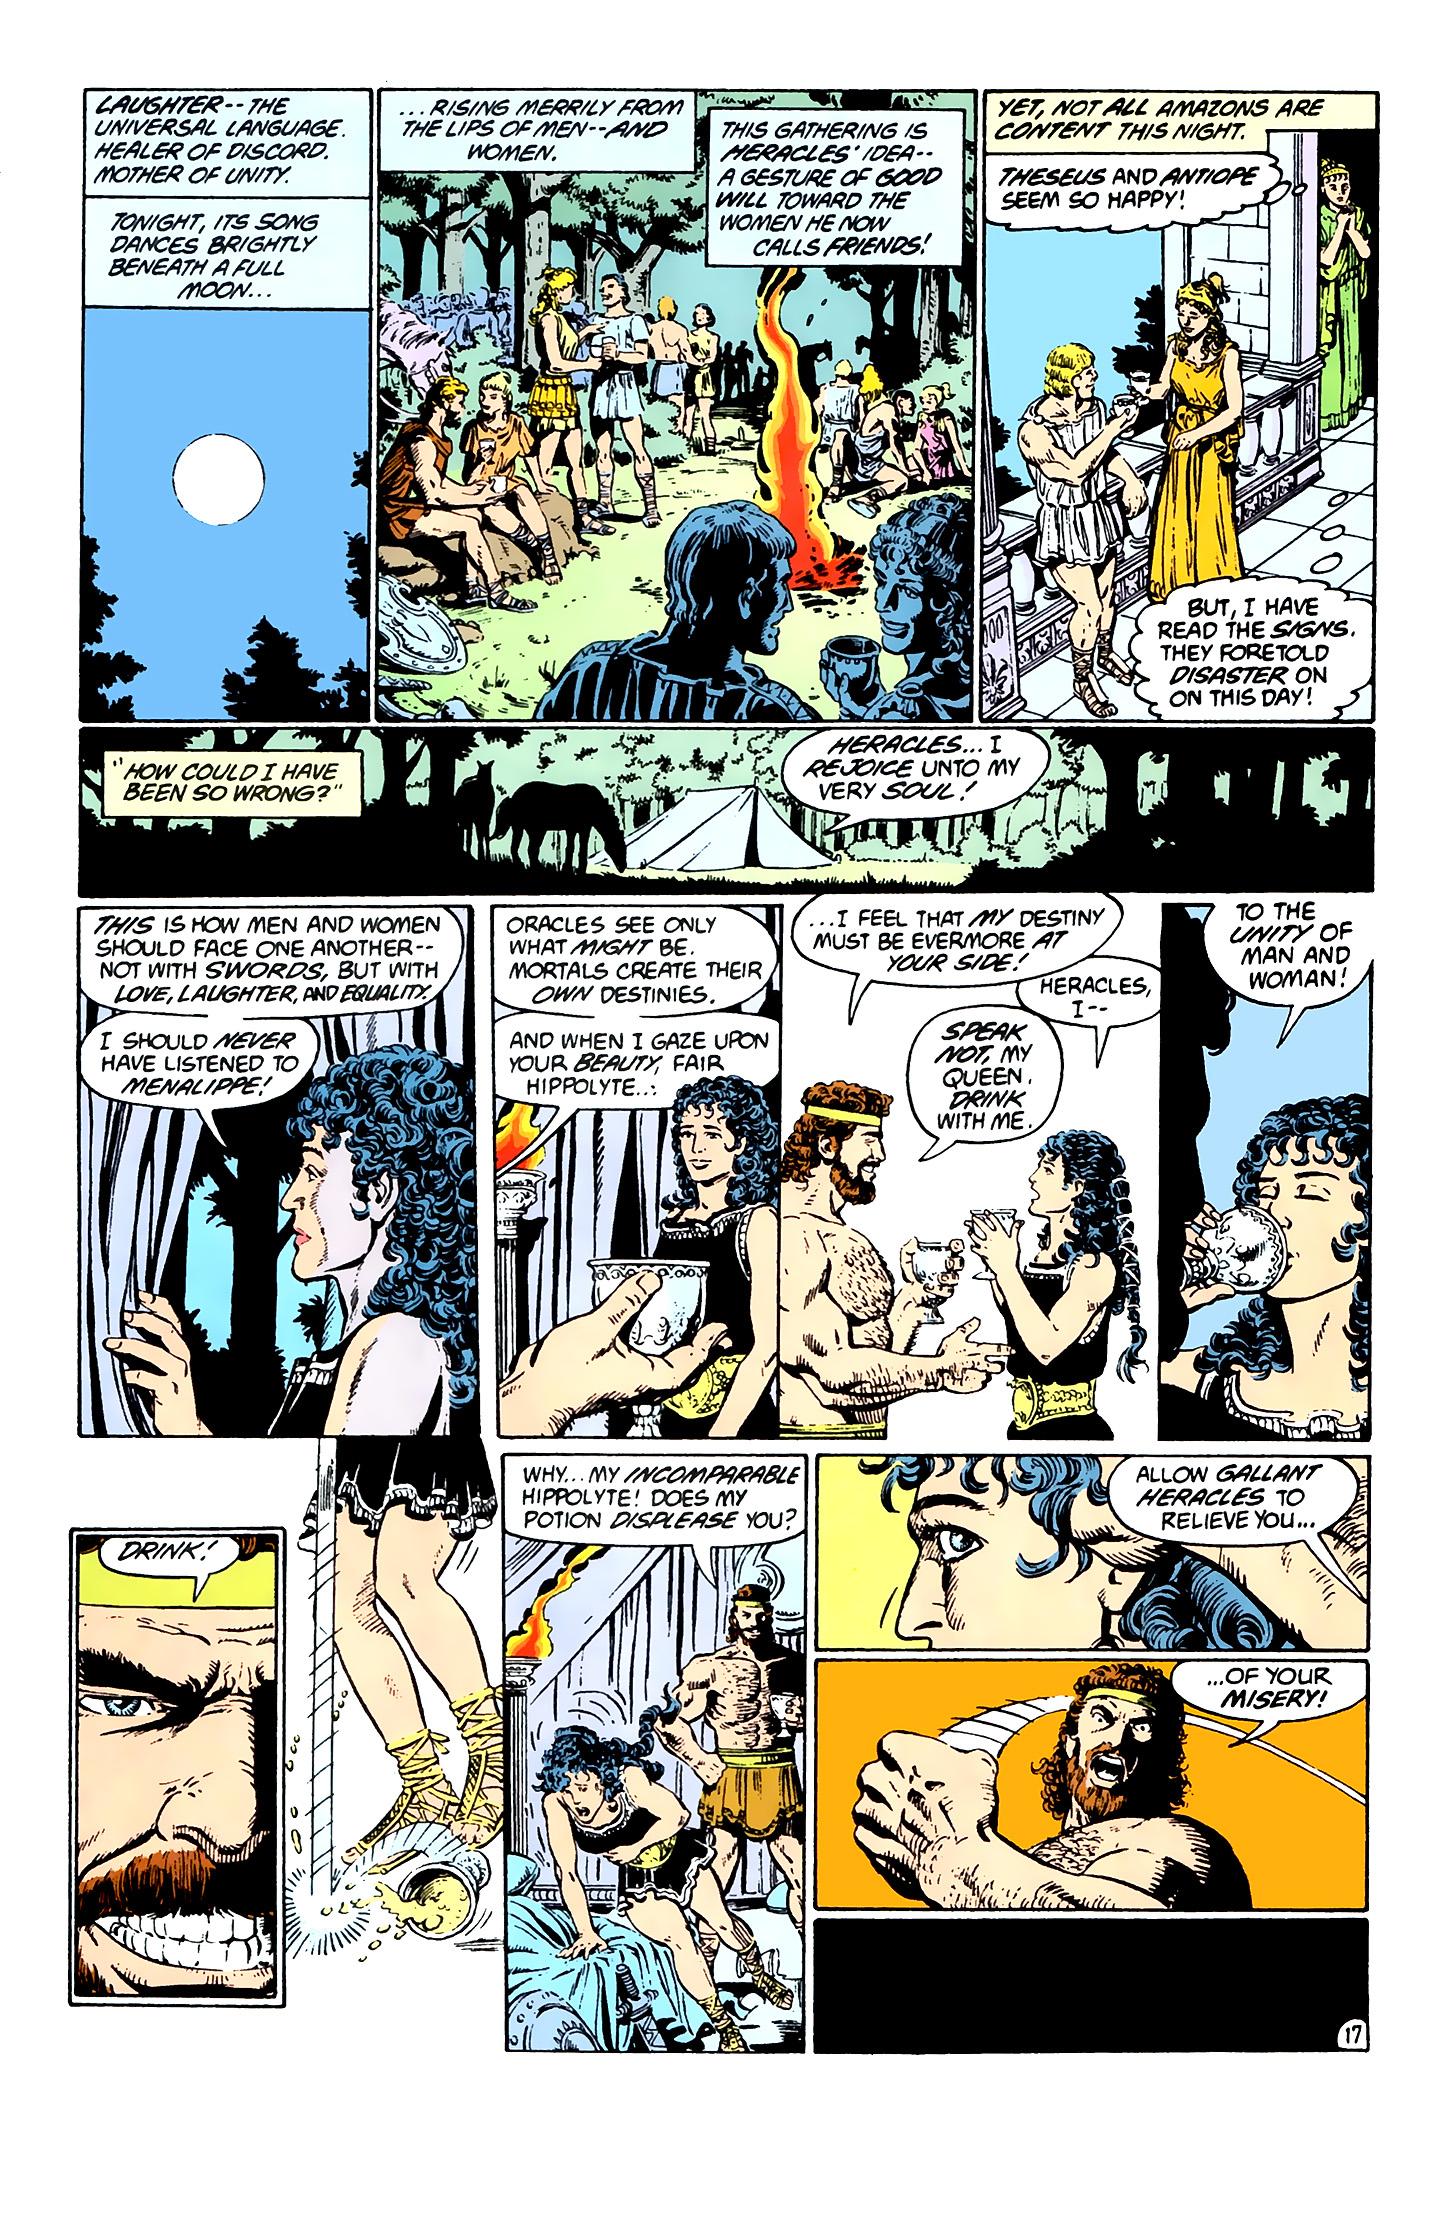 Read online Wonder Woman (1987) comic -  Issue #1 - 19